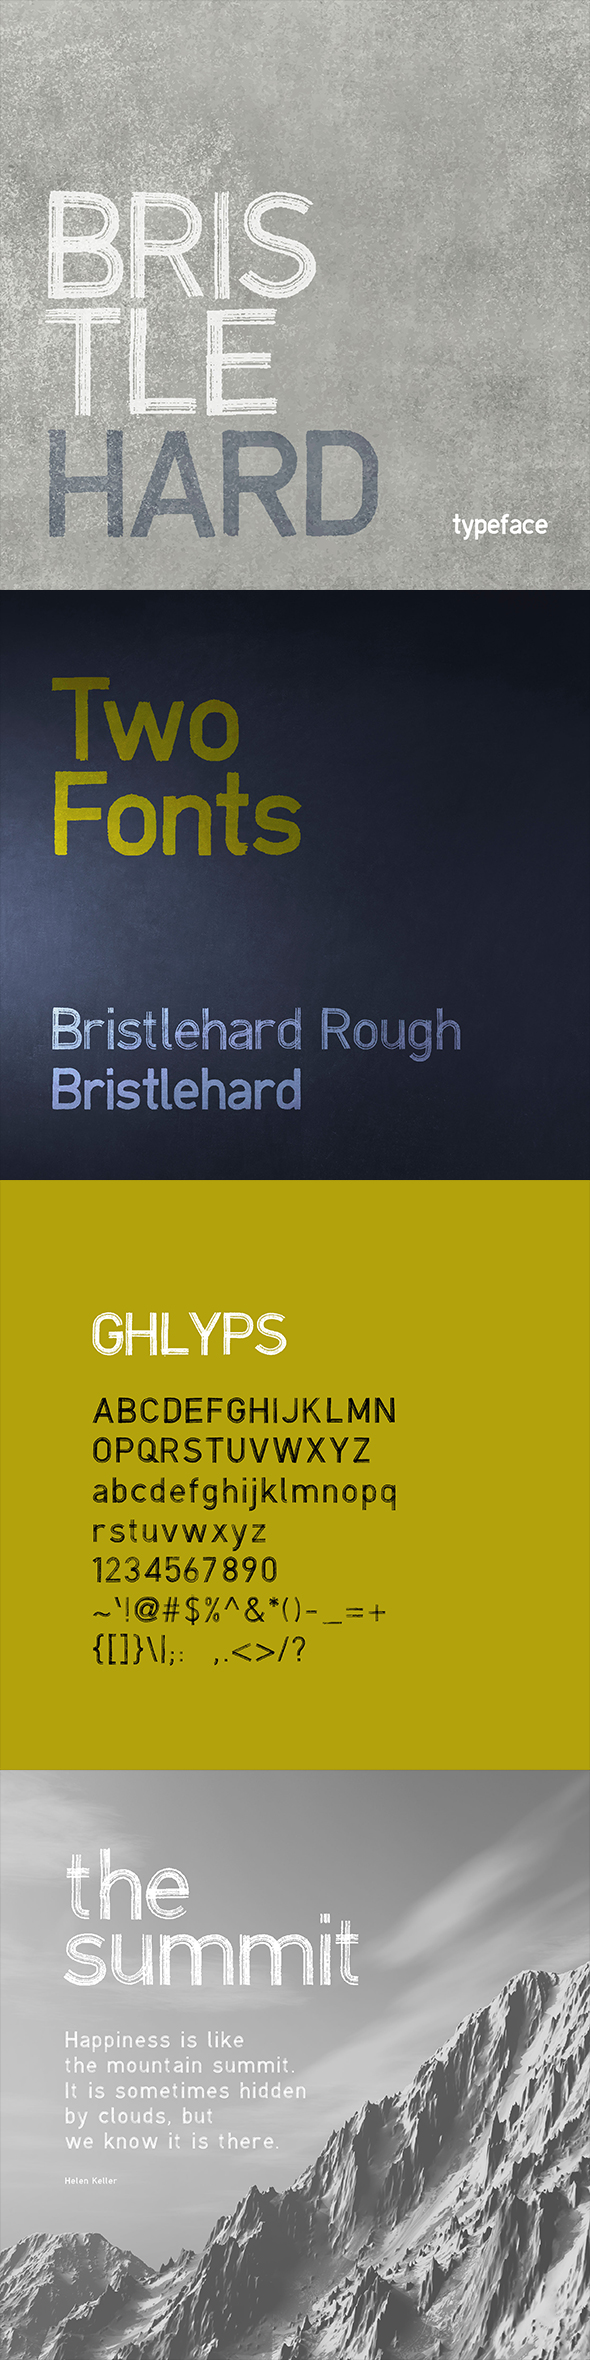 Bristlehard